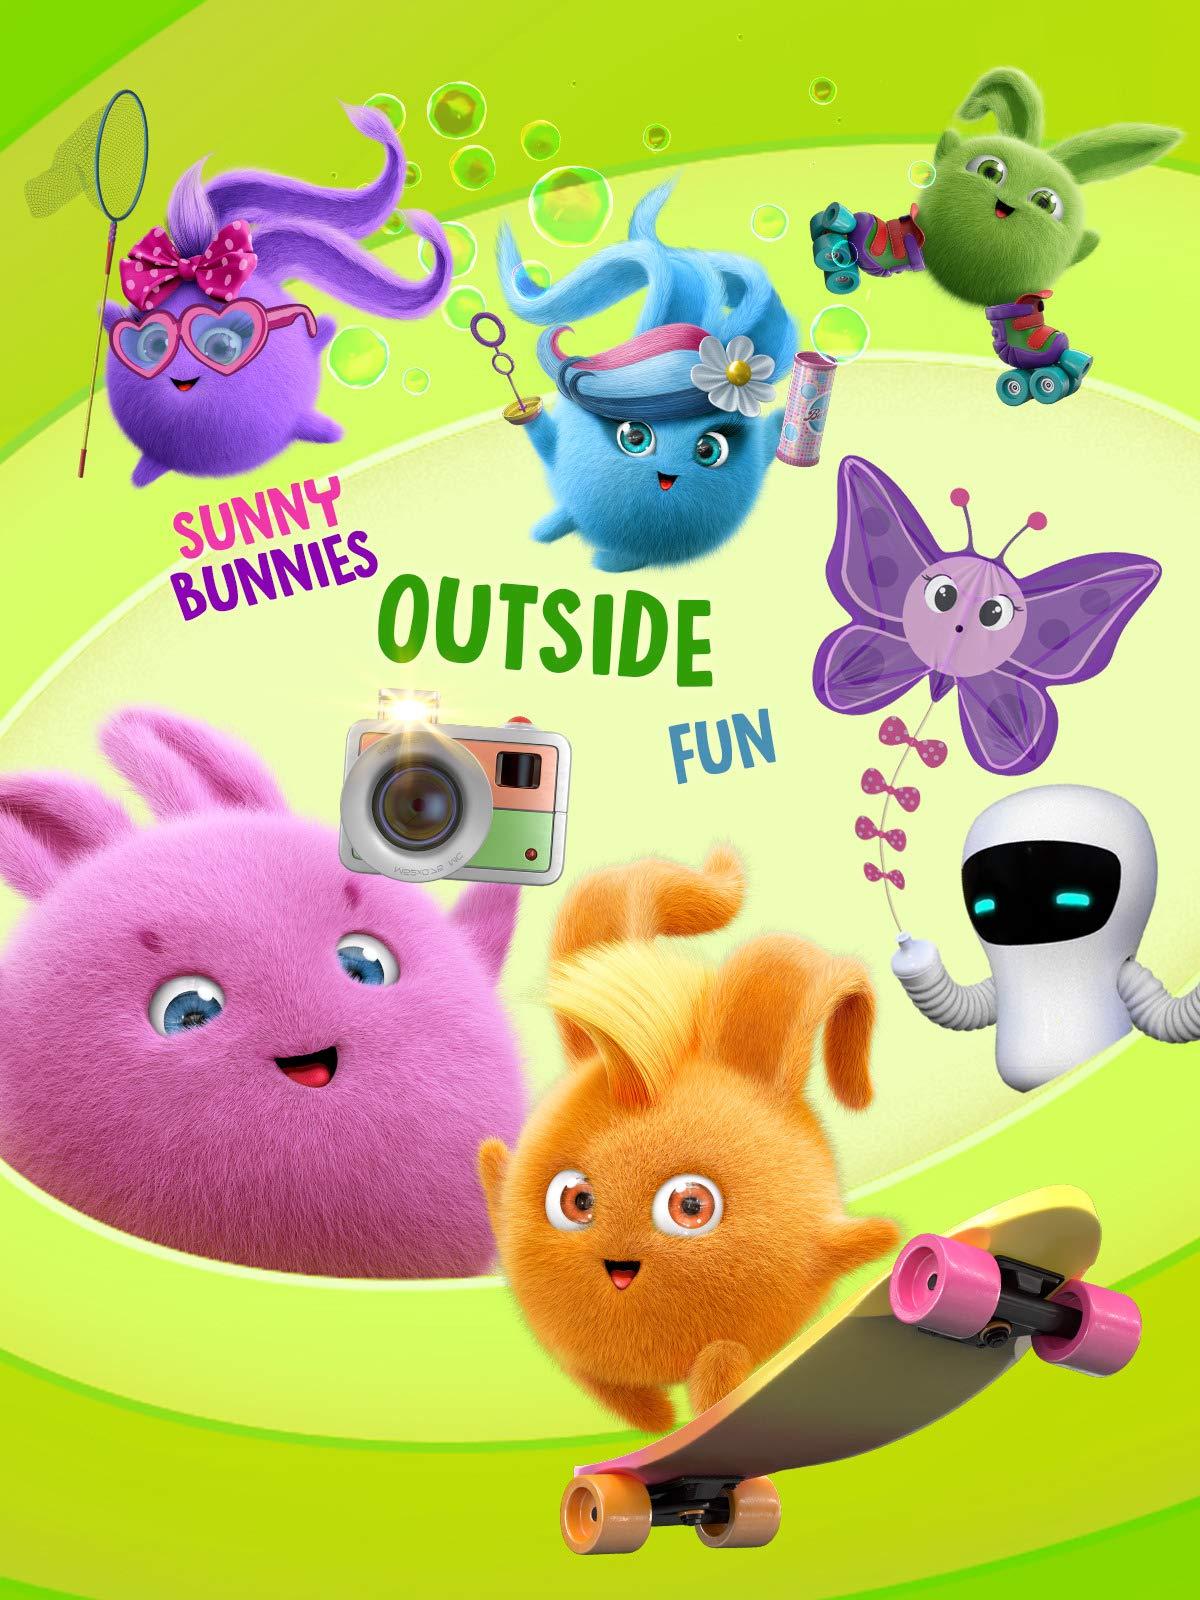 Sunny Bunnies - Outside Fun